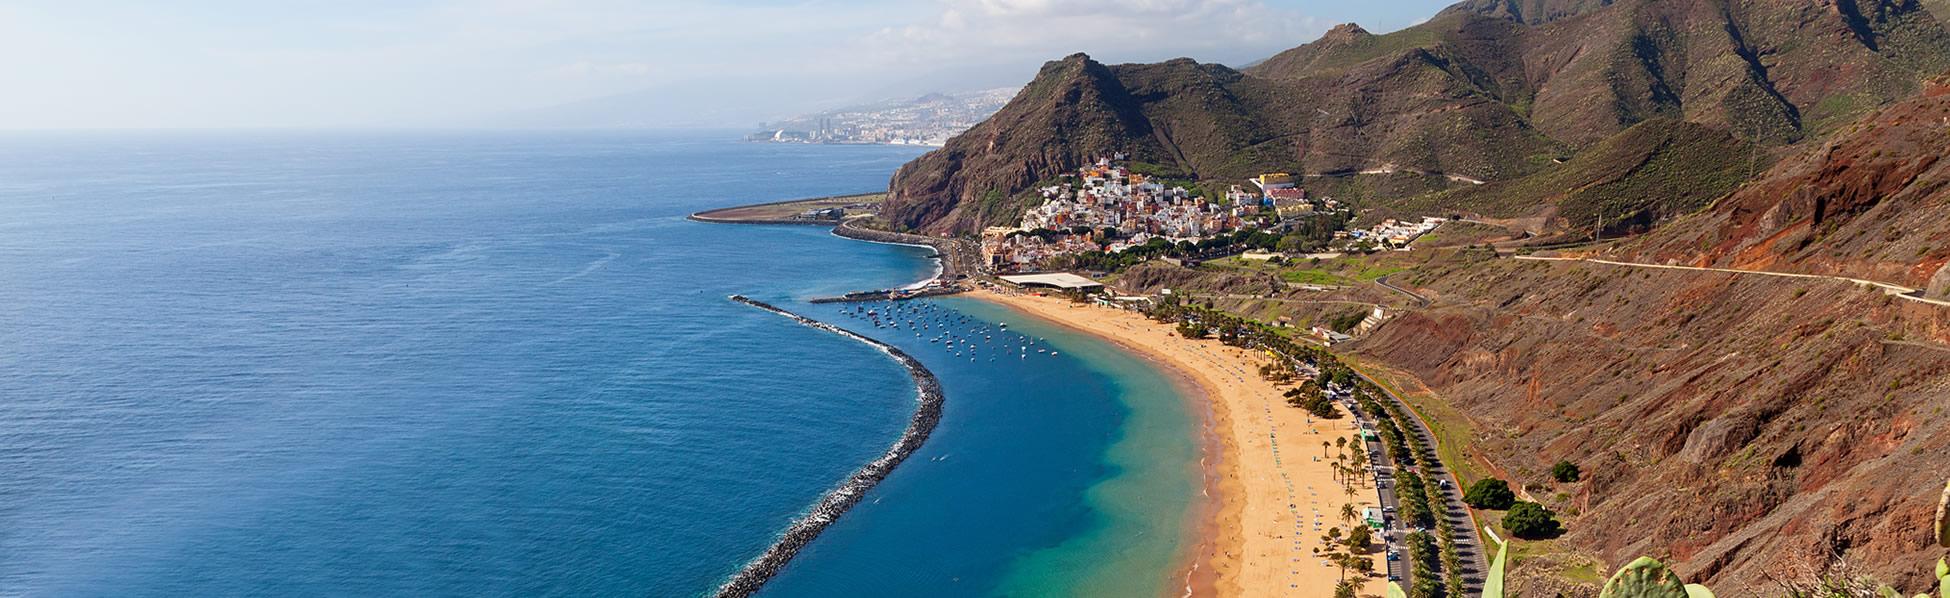 Canary Islands Cruises 2018 2019 Barrhead Travel